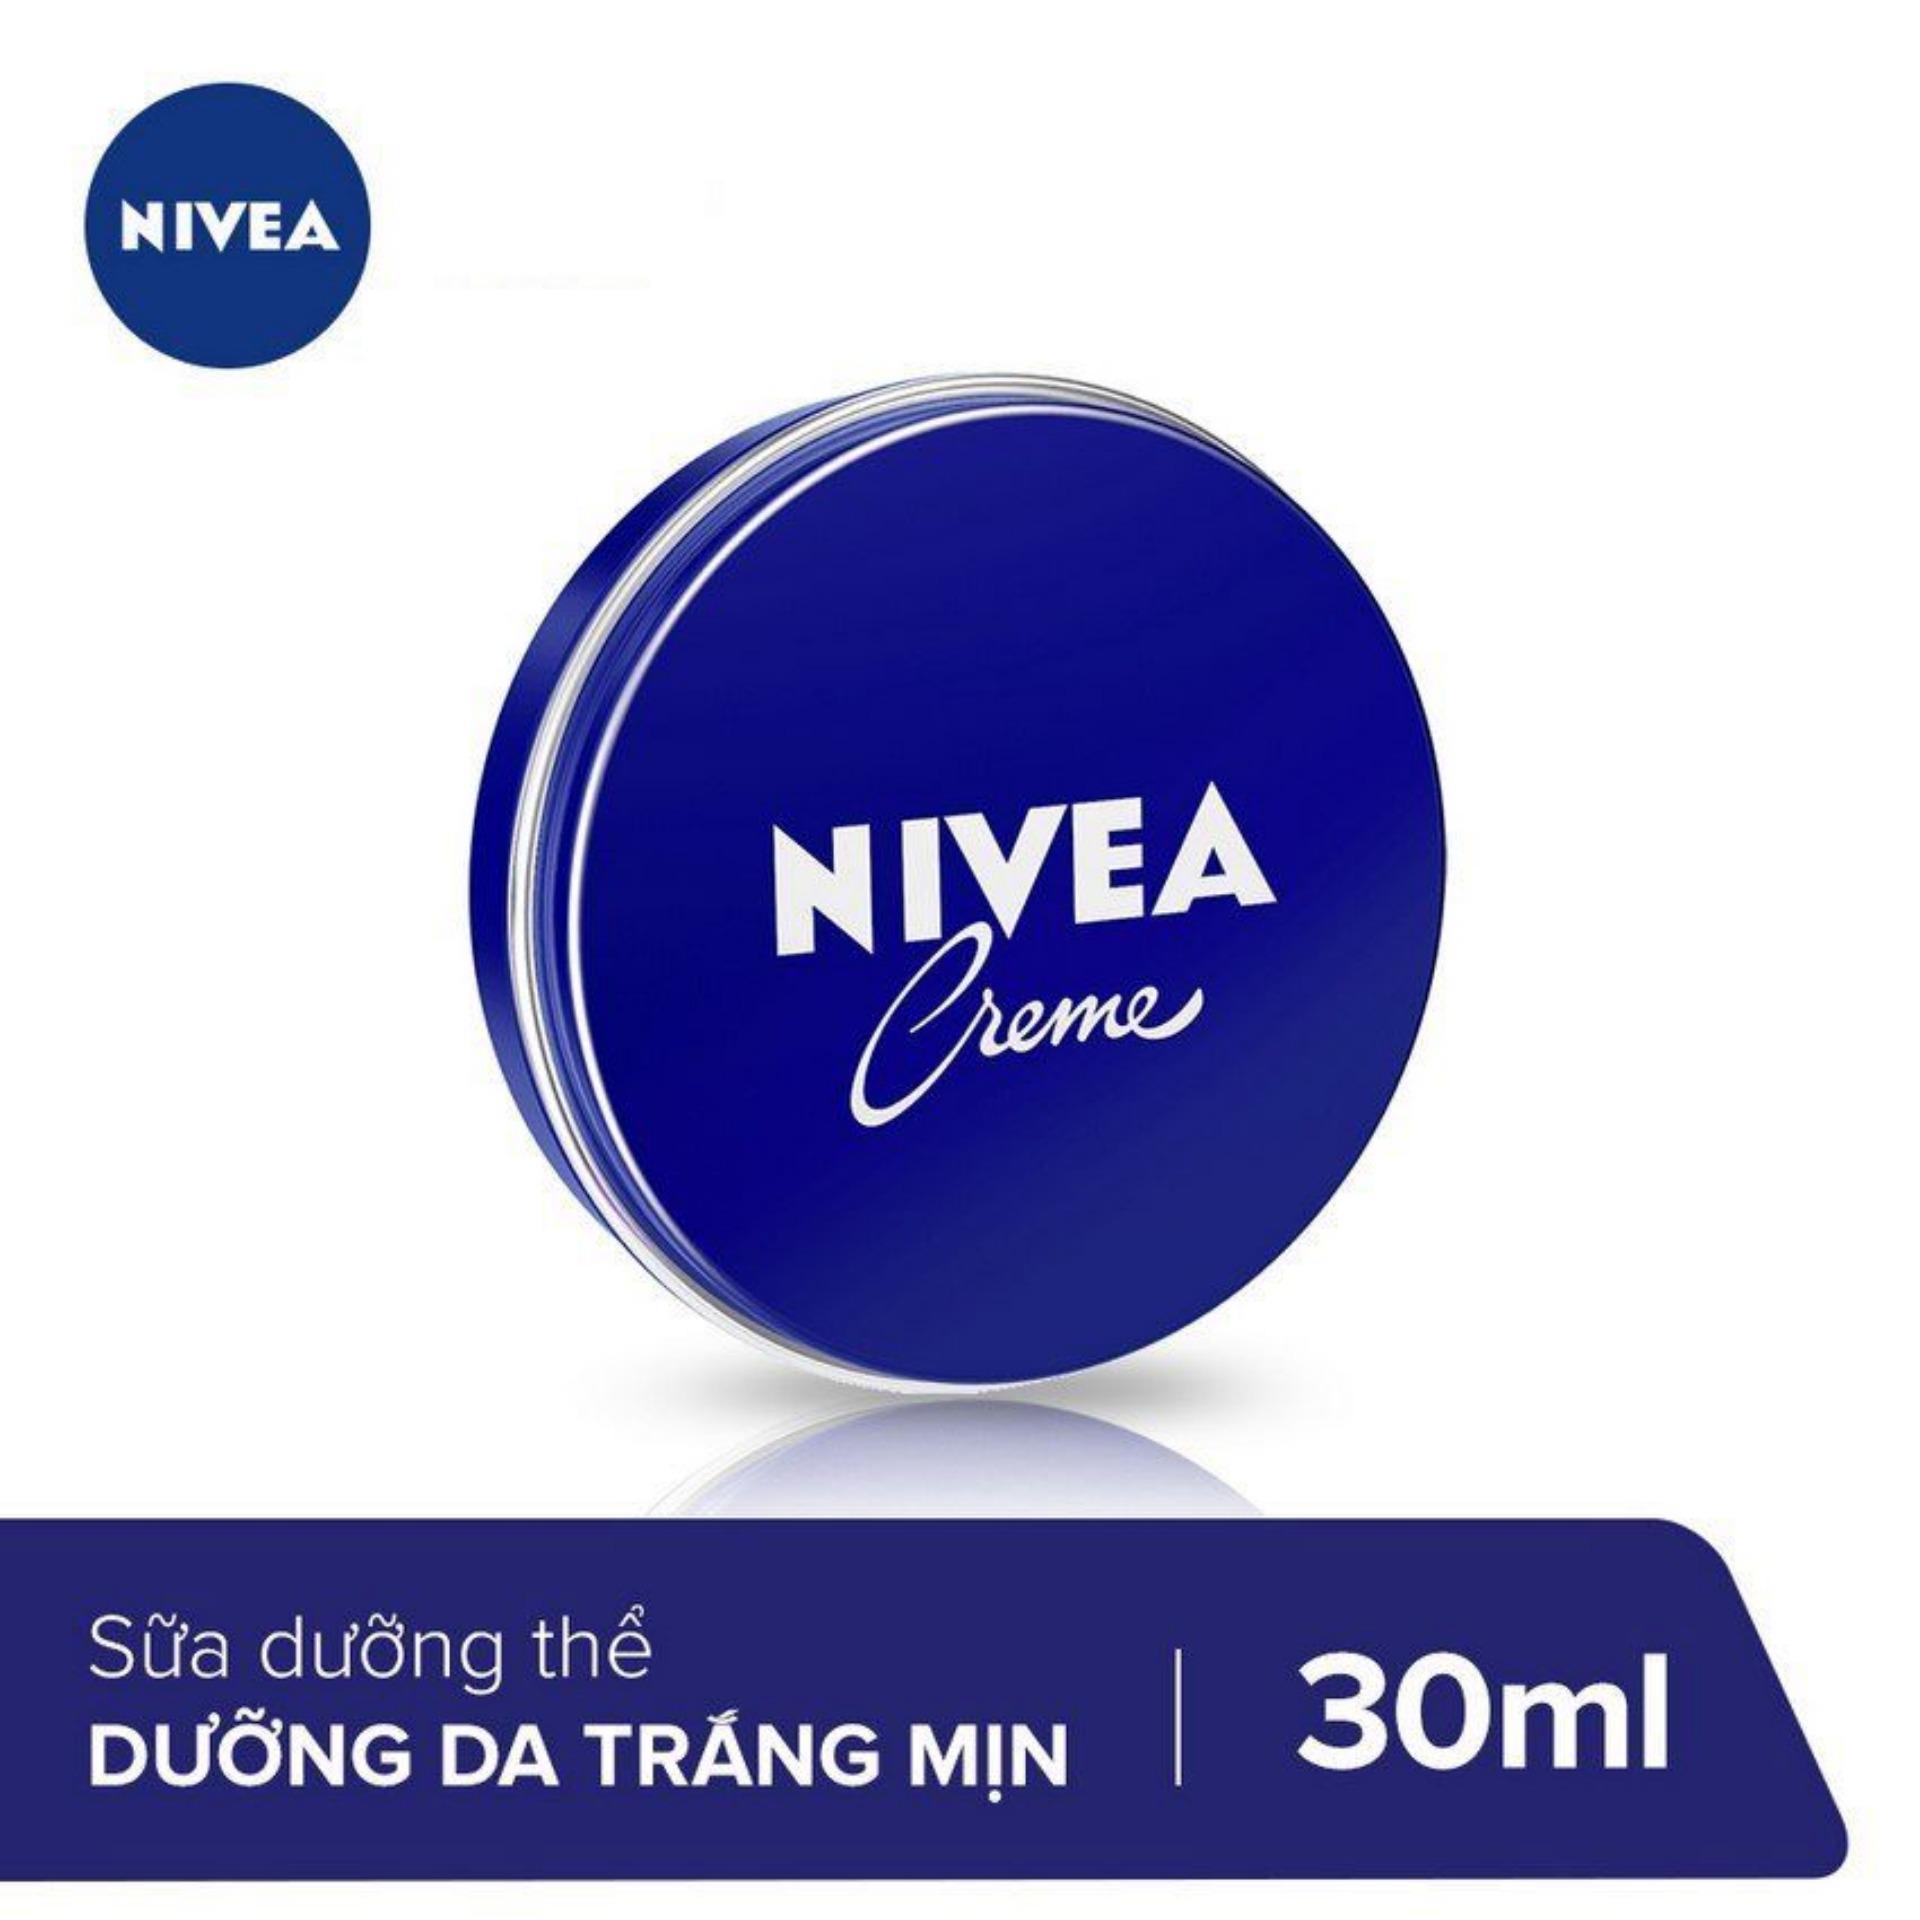 Kem dưỡng ẩm da Nivea Creame 30ml _ 80101